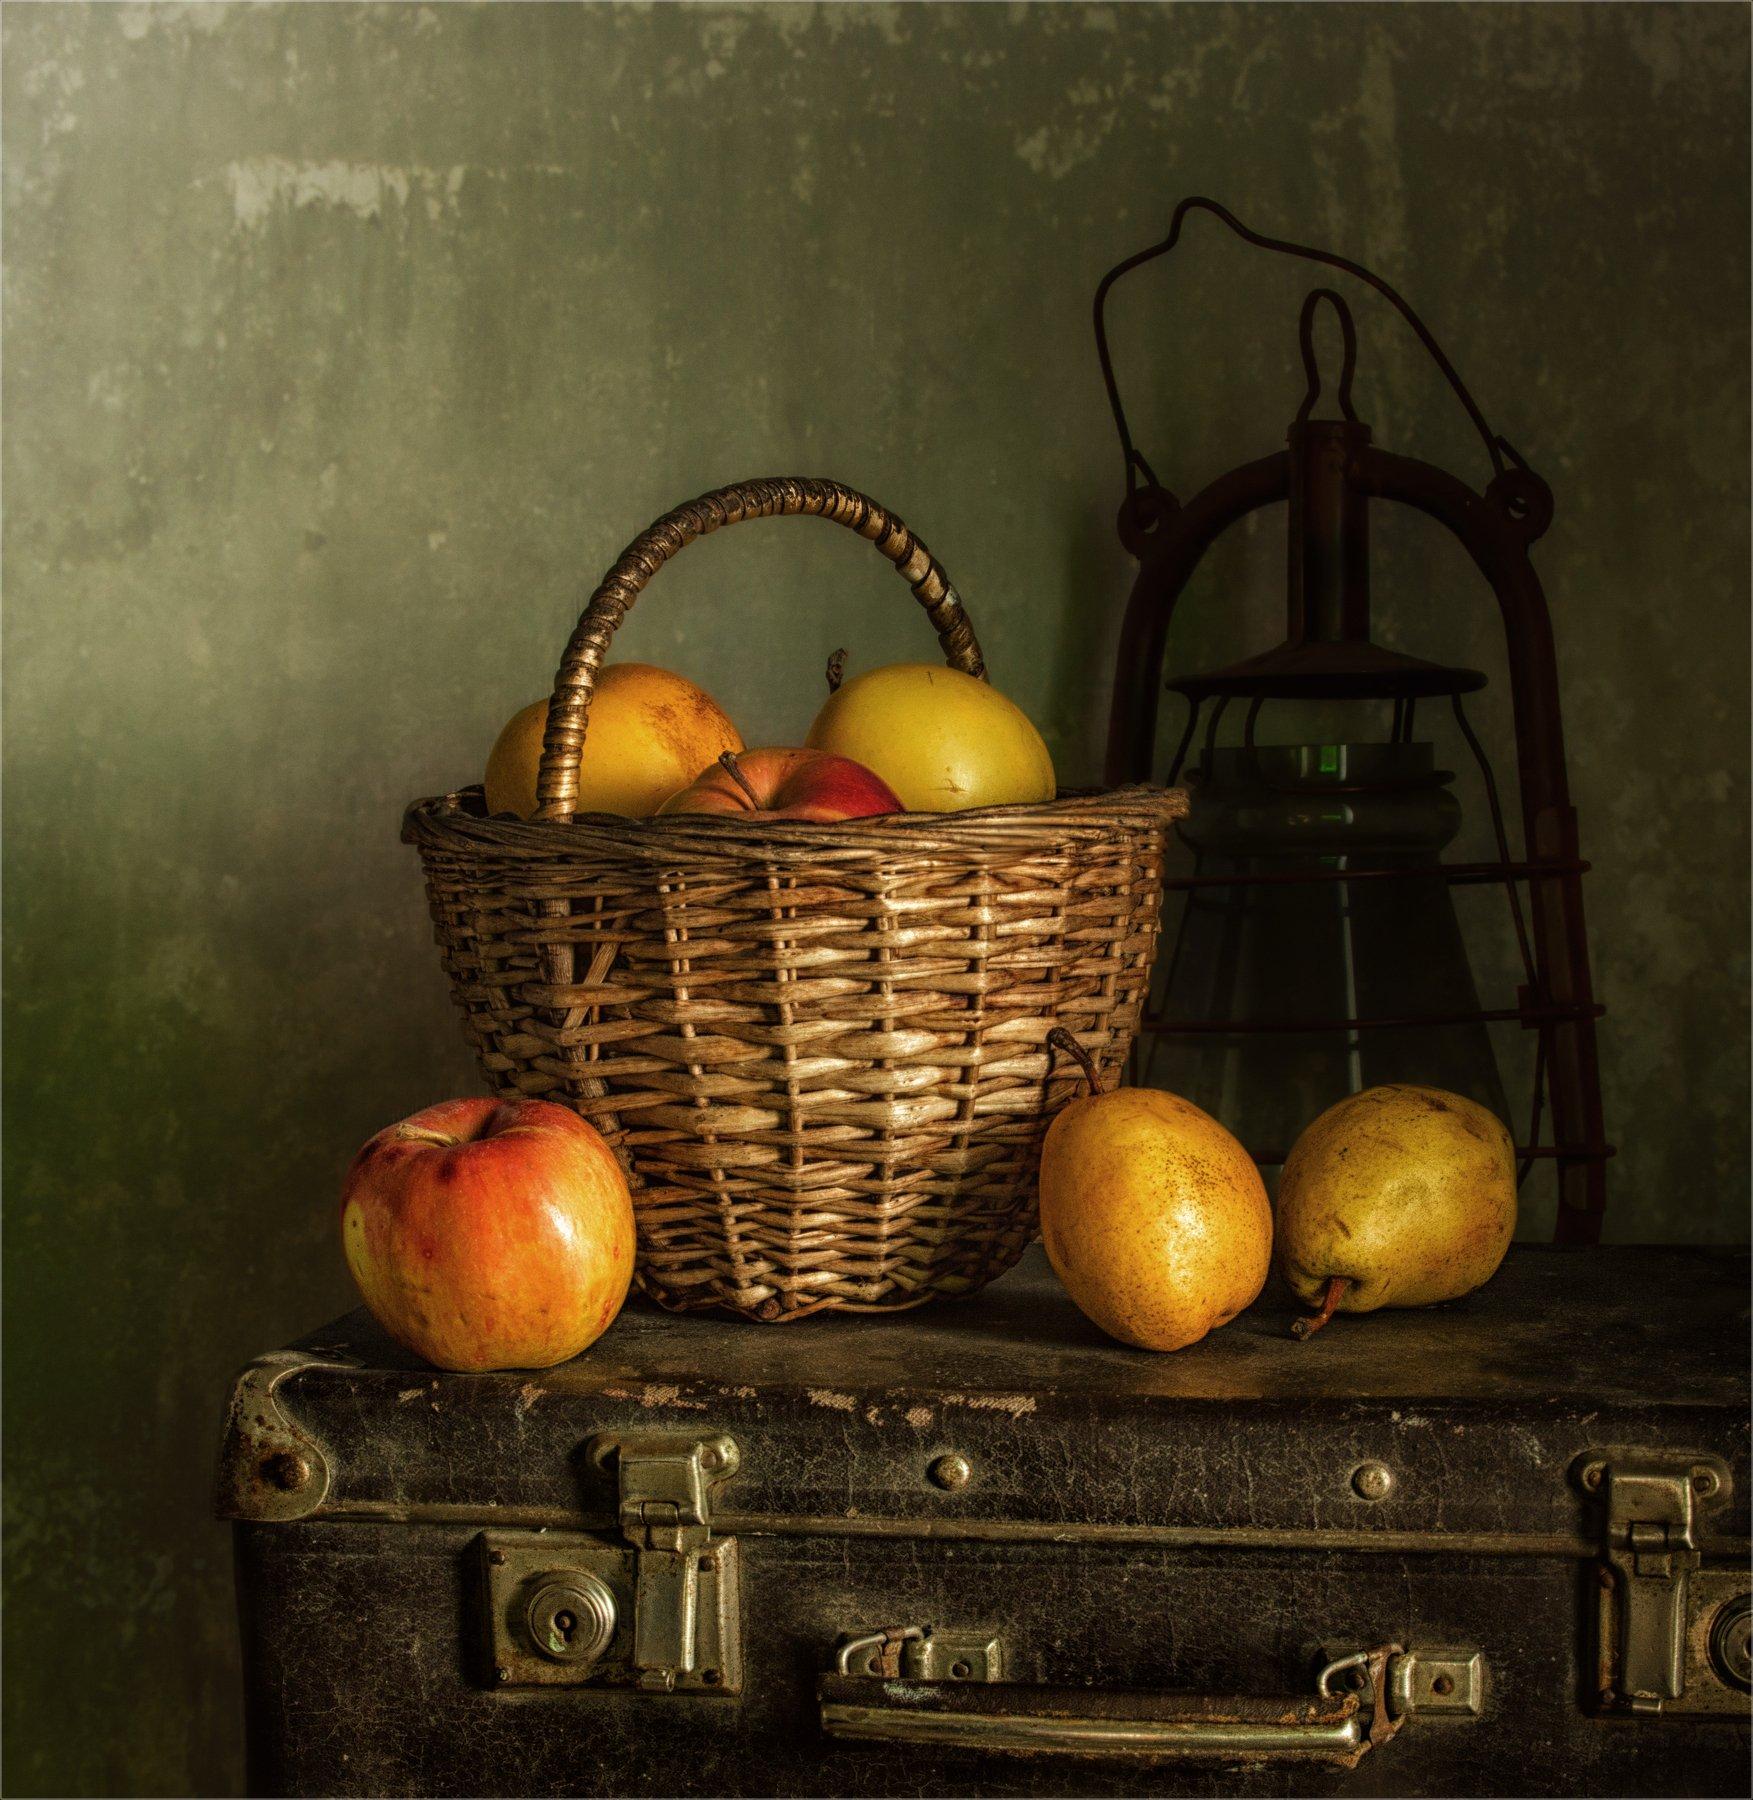 still life, натюрморт, винтаж, ретро,  стилизация,  еда, чемодан,фрукты, яблоки, груши, керосиновая лампа, Михаил MSH